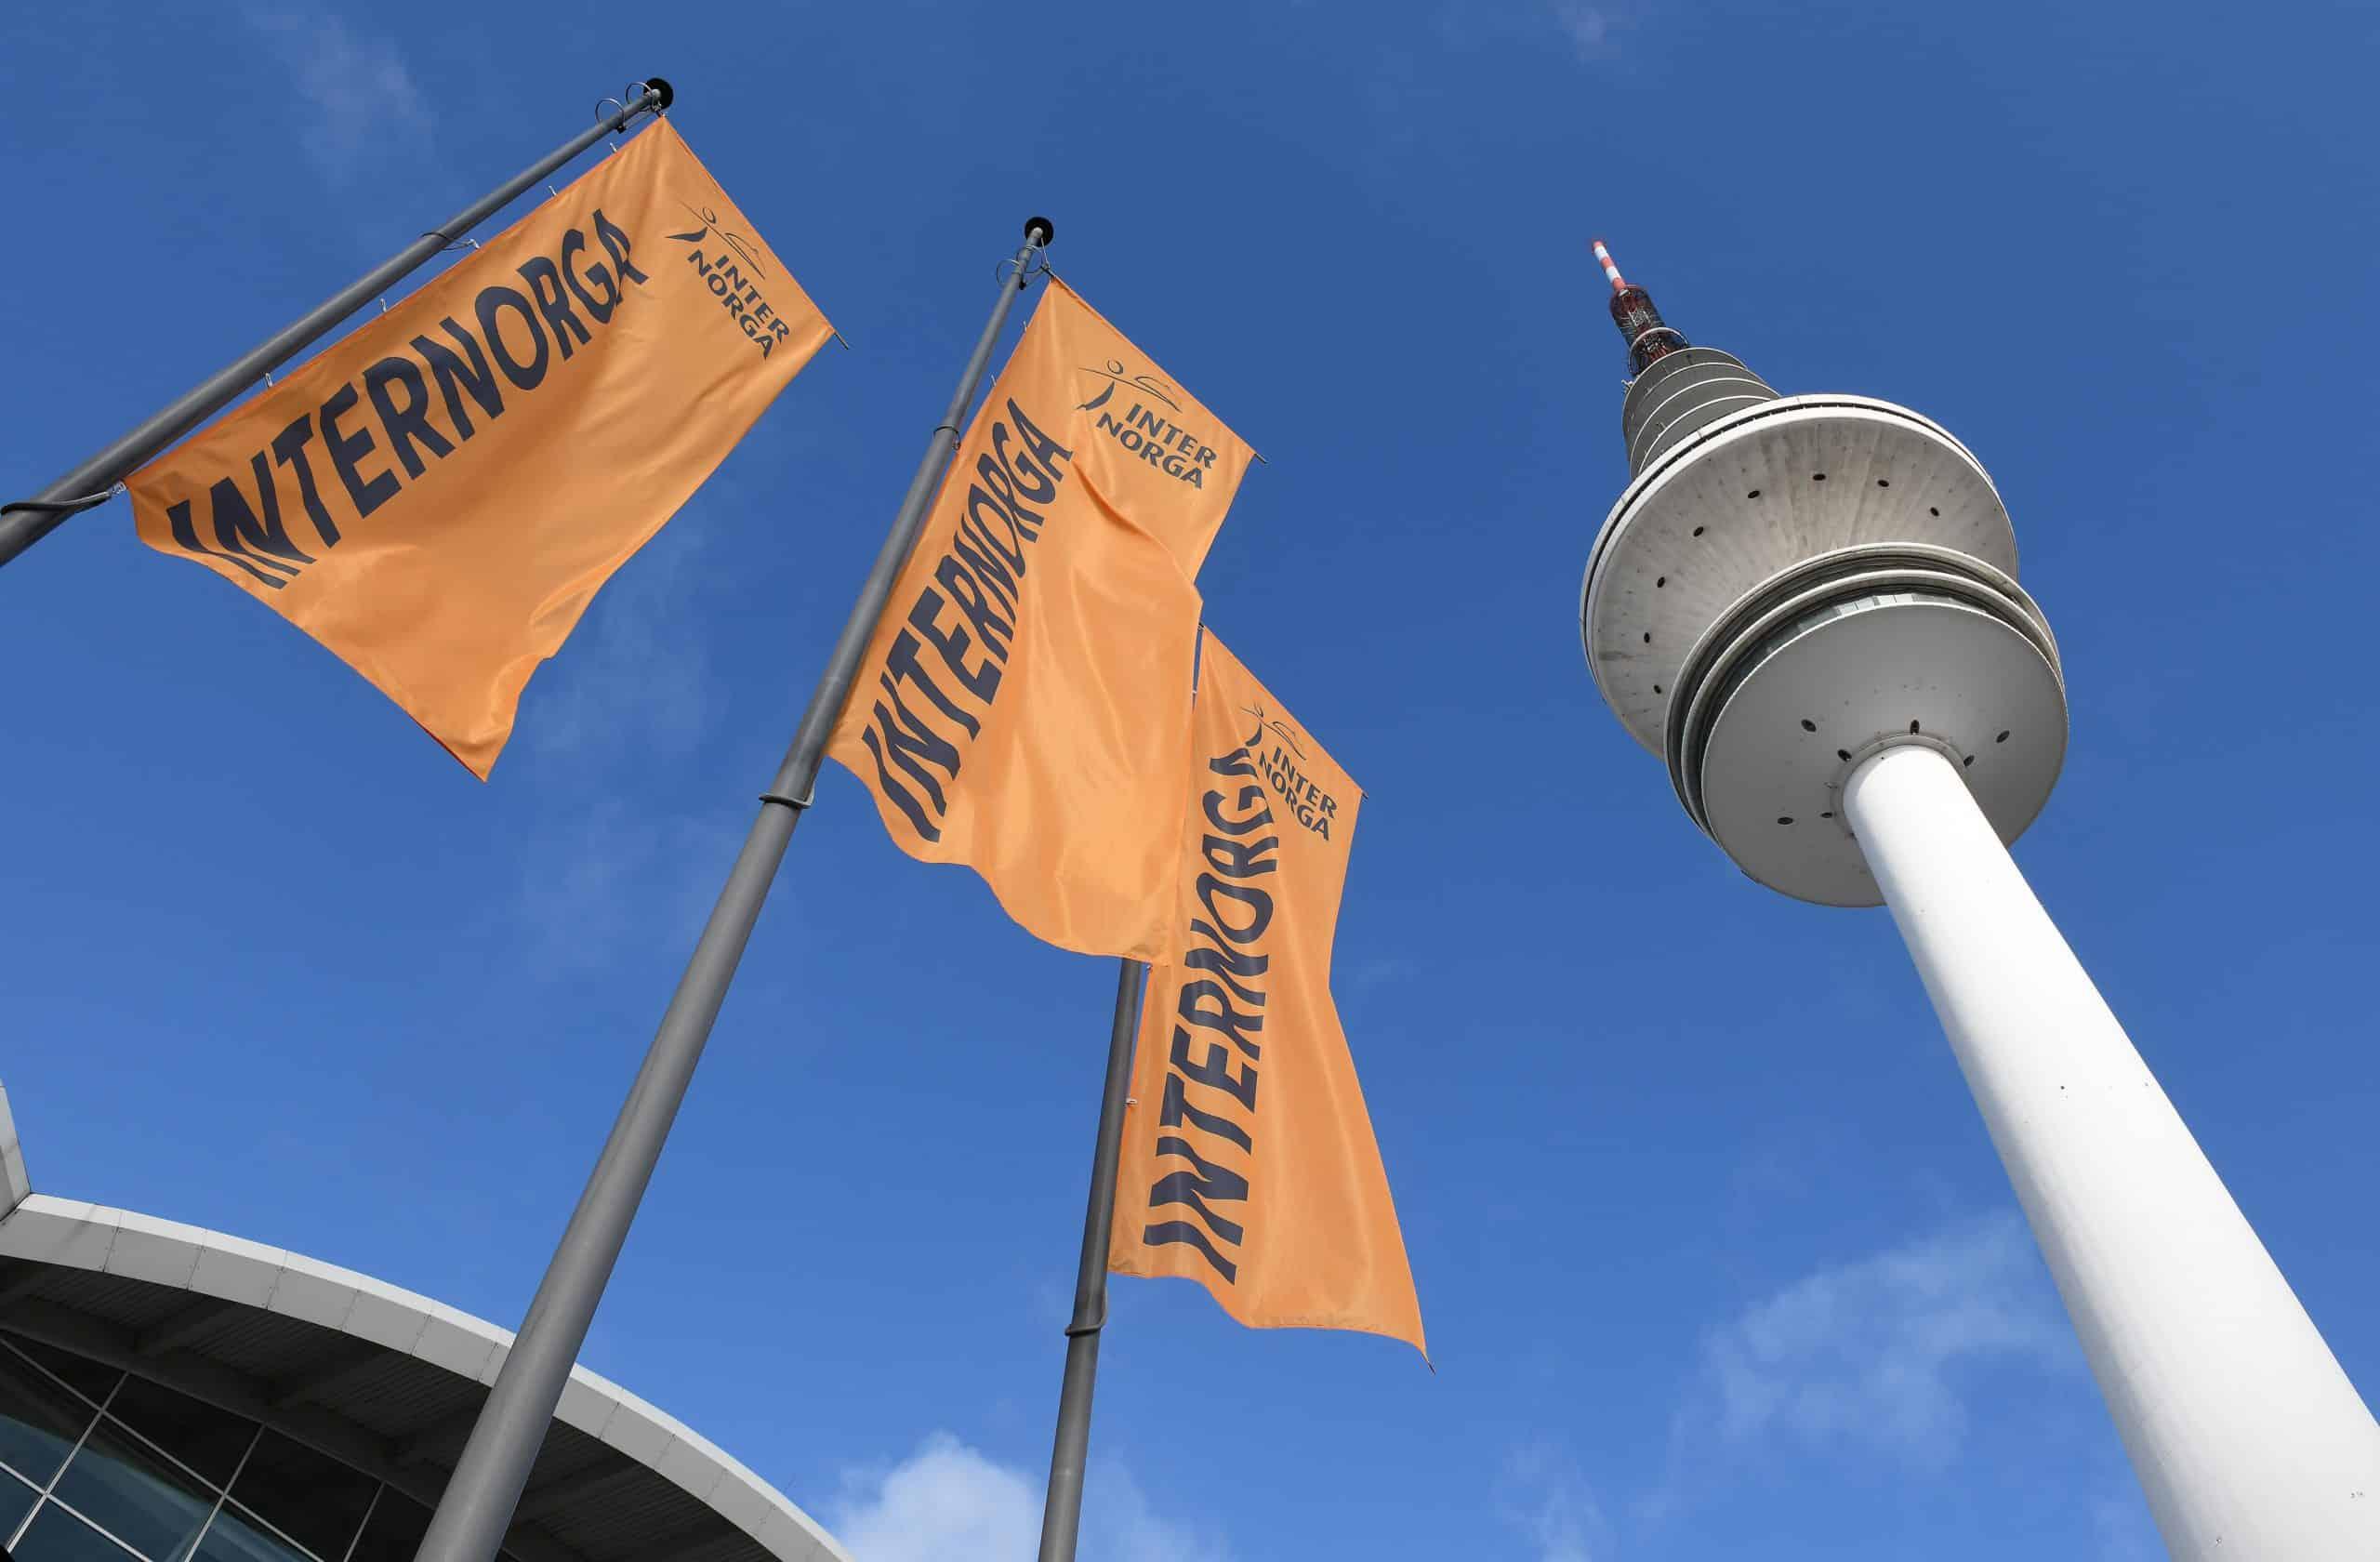 INTERNORGA 2019 Eingang Mitte Messeplatz